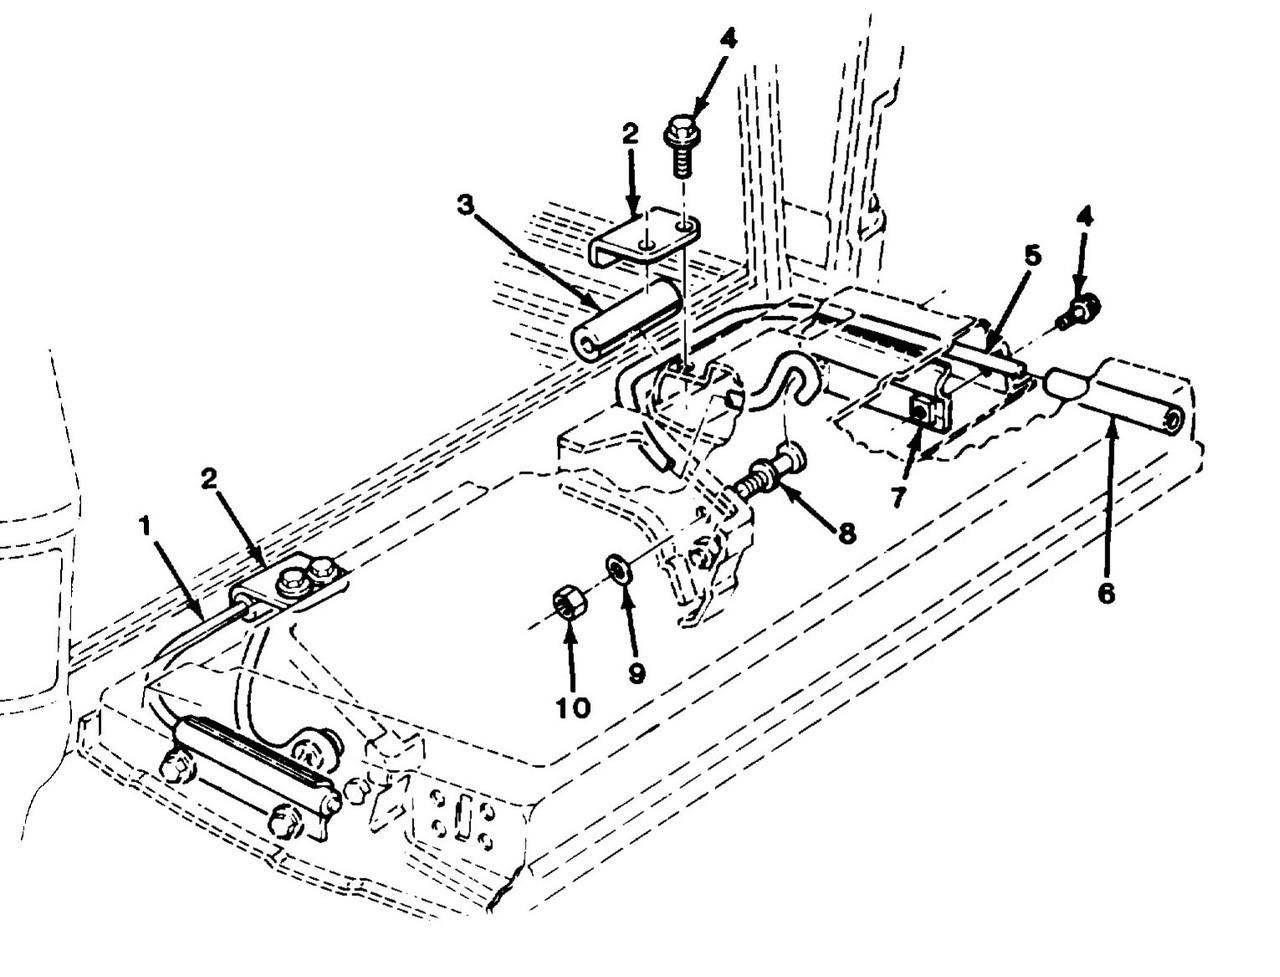 M1009 tailgate torque rod set on m38a1 wiring diagram, m11 wiring diagram, m813 wiring diagram, m1008 wiring diagram, m151a2 wiring diagram, humvee wiring diagram, chevy wiring diagram, trailers wiring diagram, m939 wiring diagram, cucv wiring diagram, mutt wiring diagram, general wiring diagram, m35a2 wiring diagram, 4x4 wiring diagram, m998 wiring diagram, m1010 wiring diagram, m12 wiring diagram, jeep wiring diagram, m715 wiring diagram, truck wiring diagram,